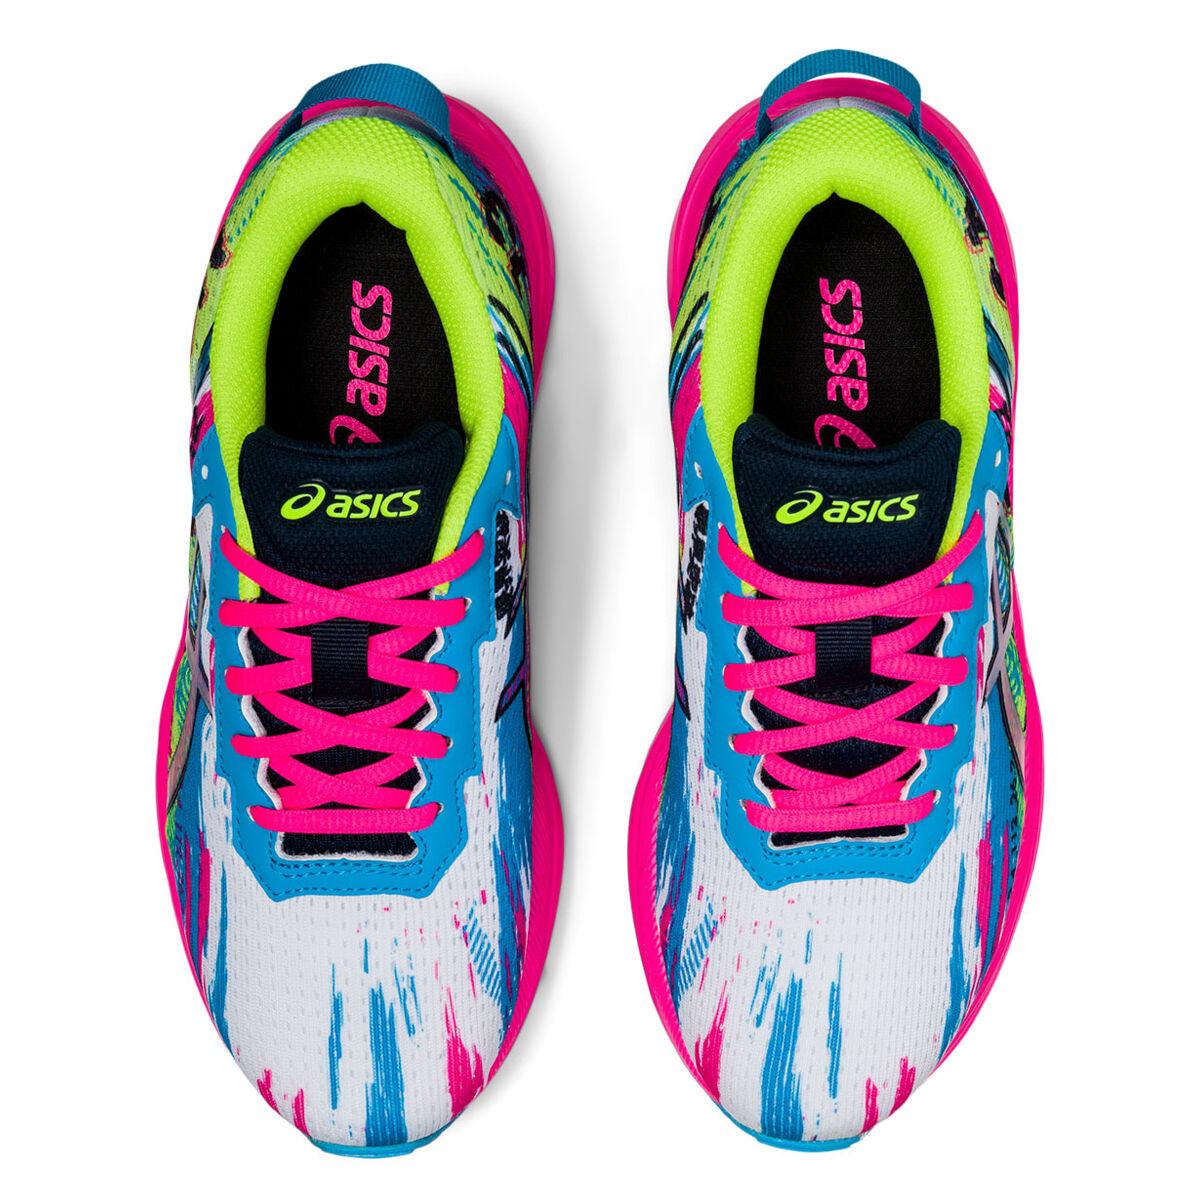 new white nike uptowns sneakers black friday | Asics GEL Noosa Tri 13 Kids Running Shoes